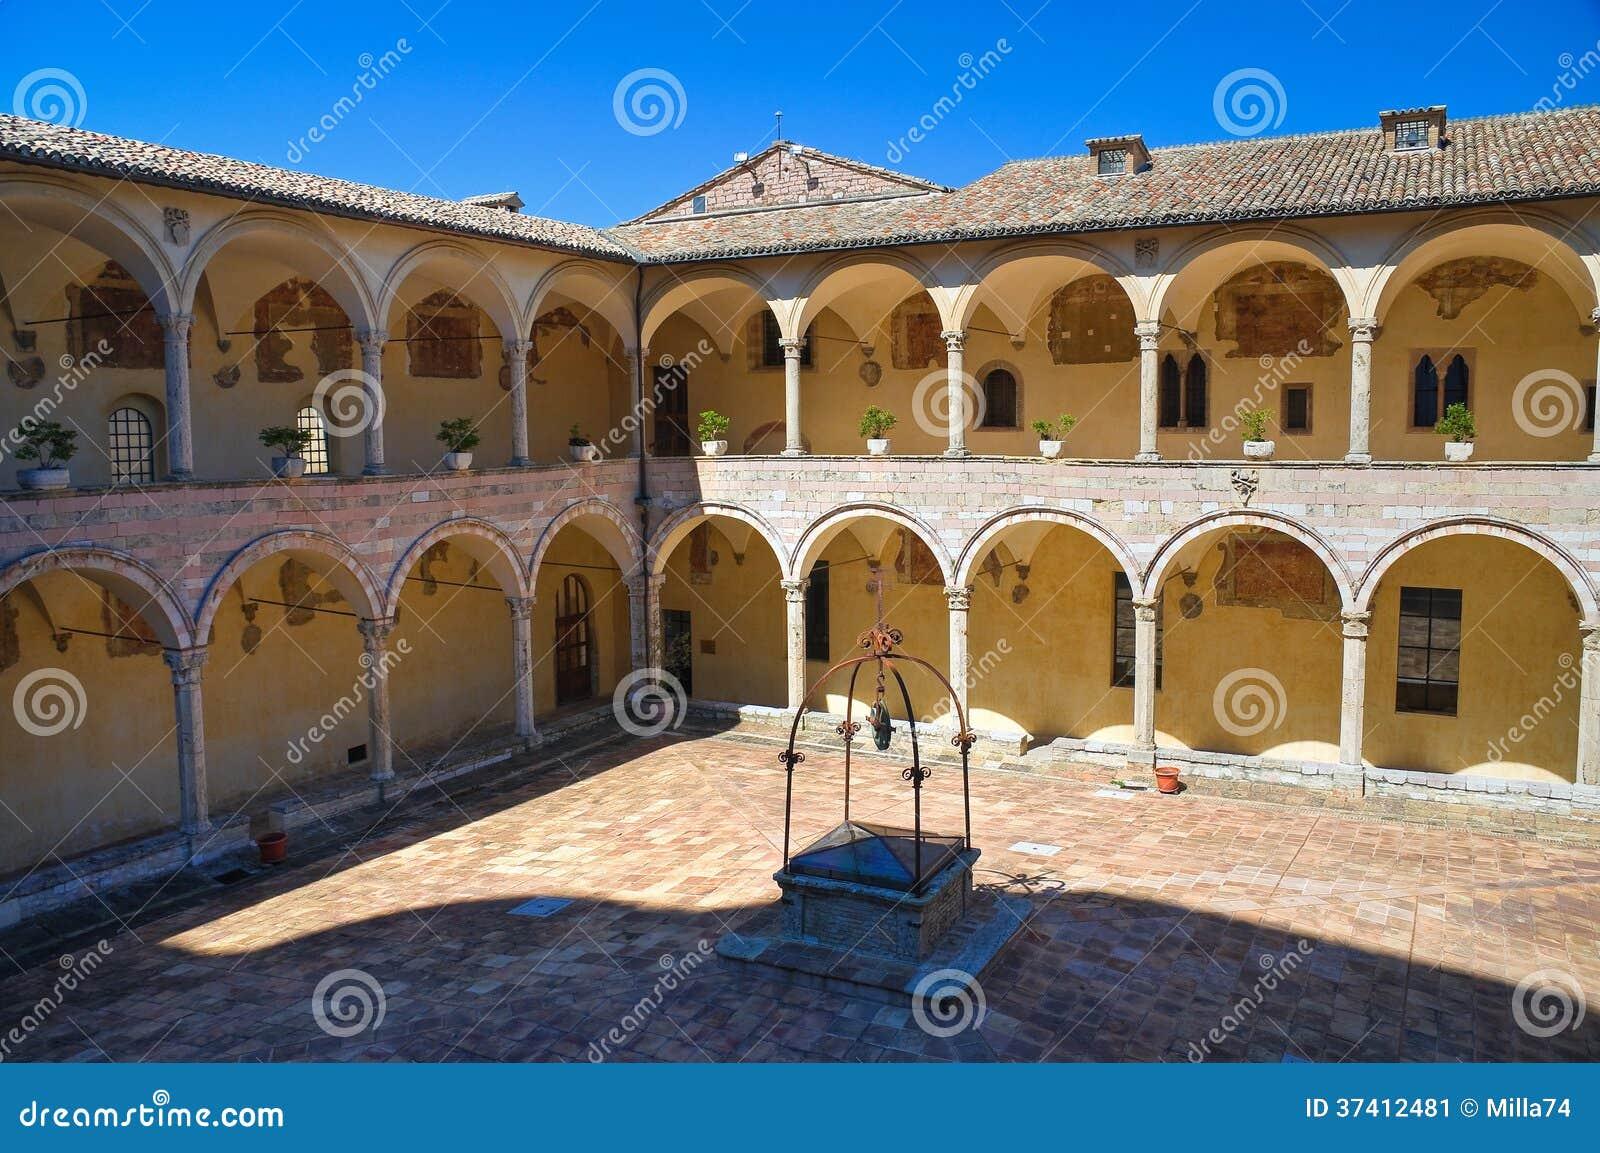 klooster-van-st-francesco-basilica-assis